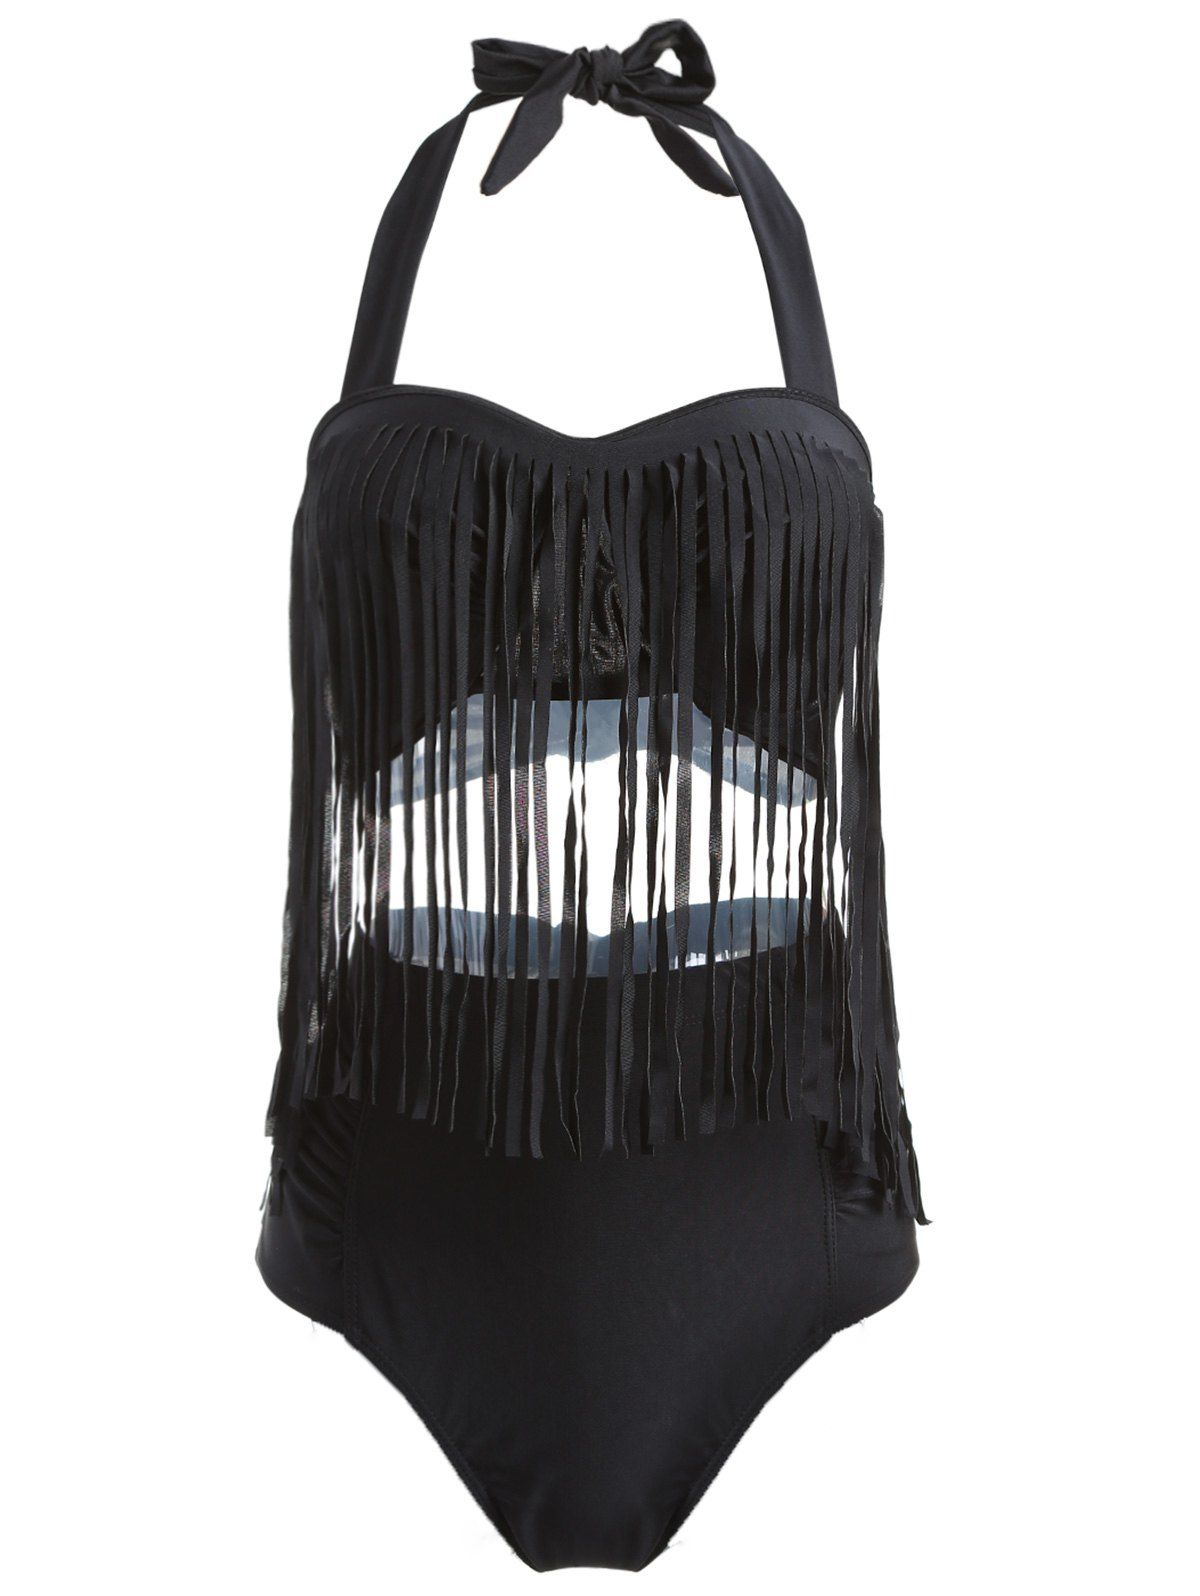 Alluring Solid Color High-Waisted Fringe Design Plus Size Bikini Set For Women